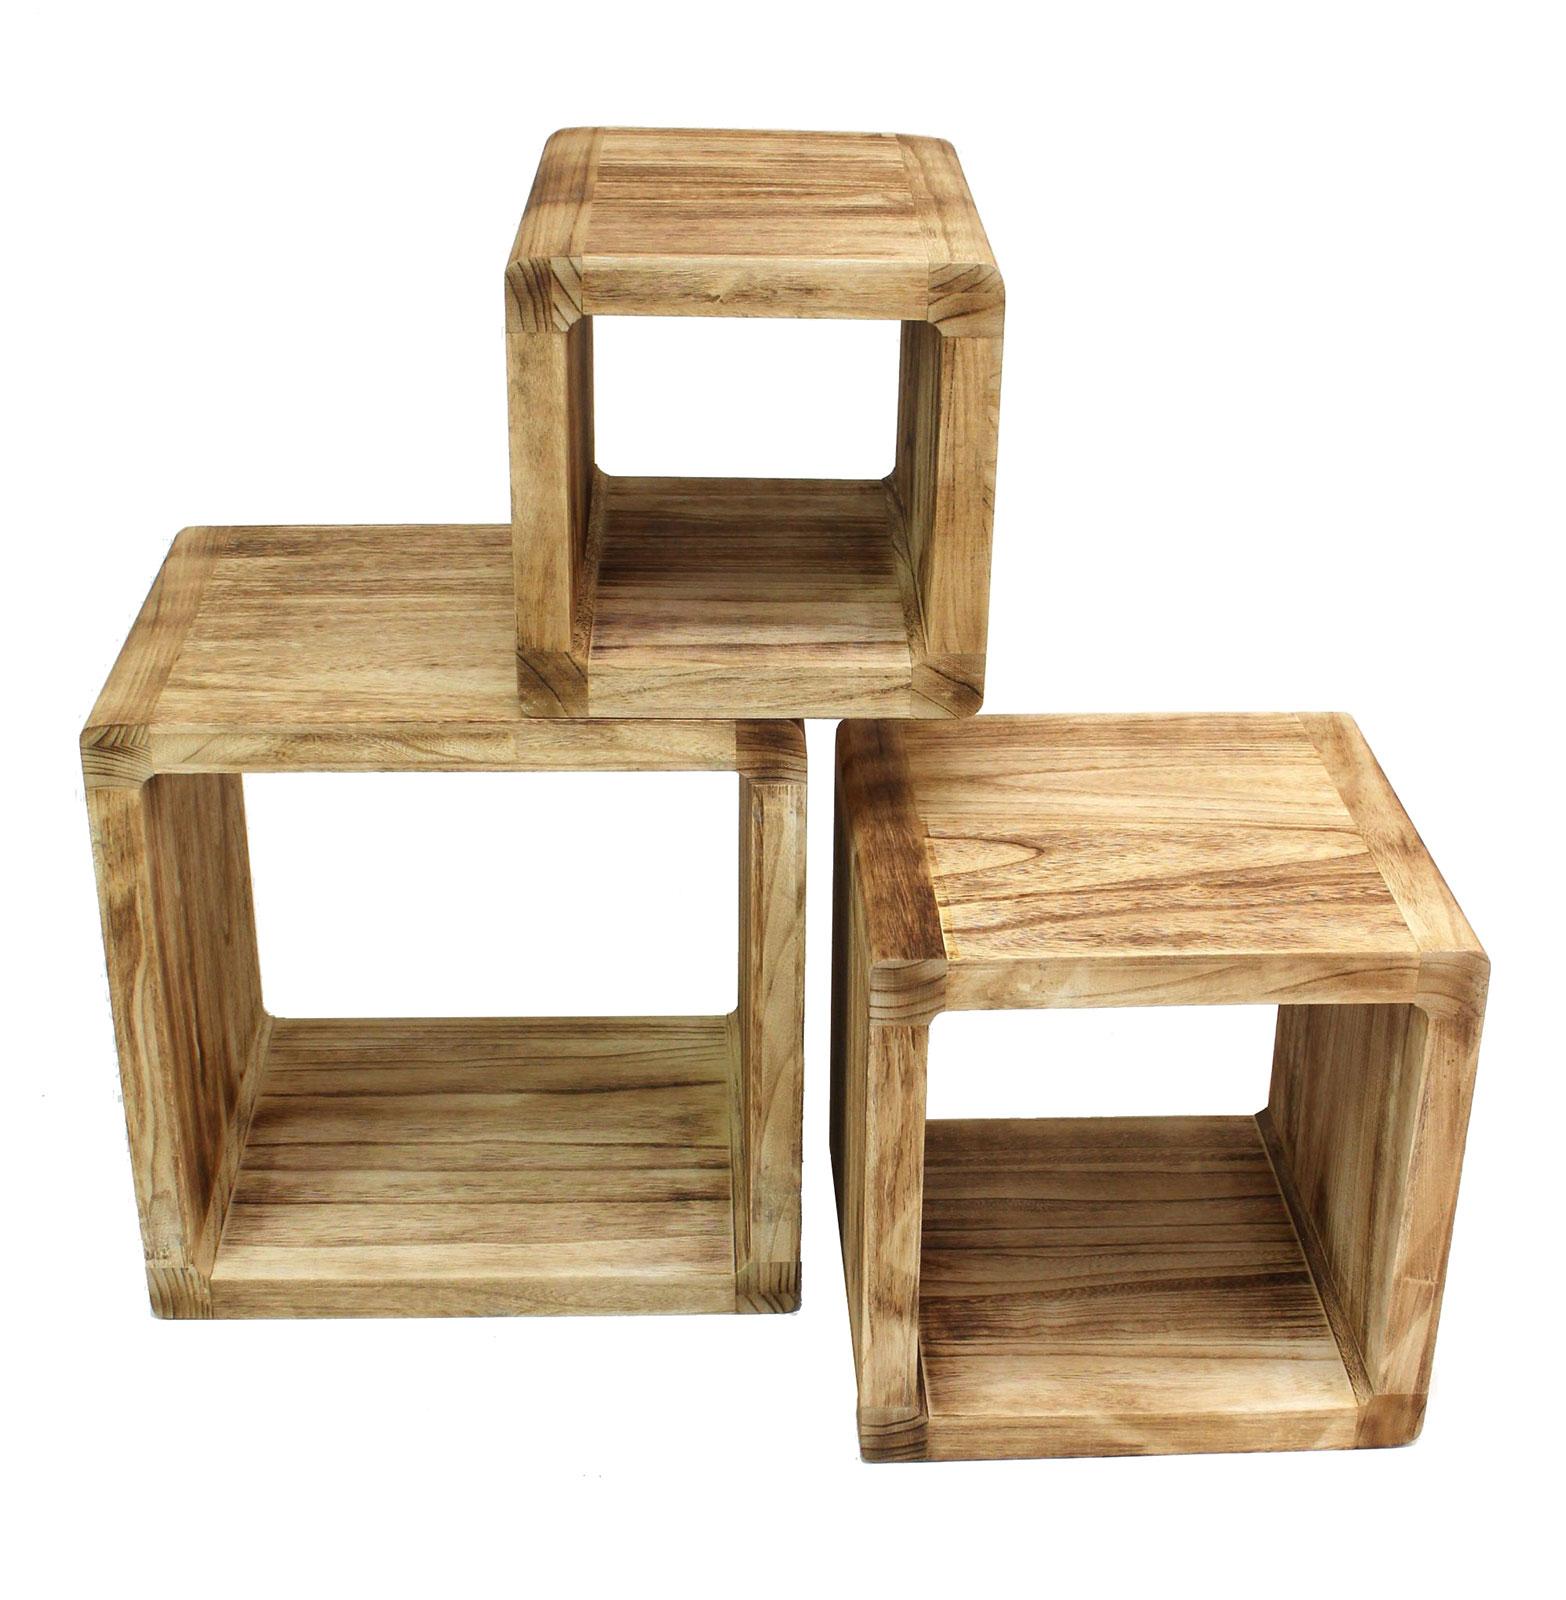 Full Size of Regale Holz 3er Set Regal Cube 44x35cm Holzregal Board Used Design Cd Garten Holzhaus Keller Nach Maß Weiß Selber Bauen Fenster Alu Betten Holzbank Regal Regale Holz